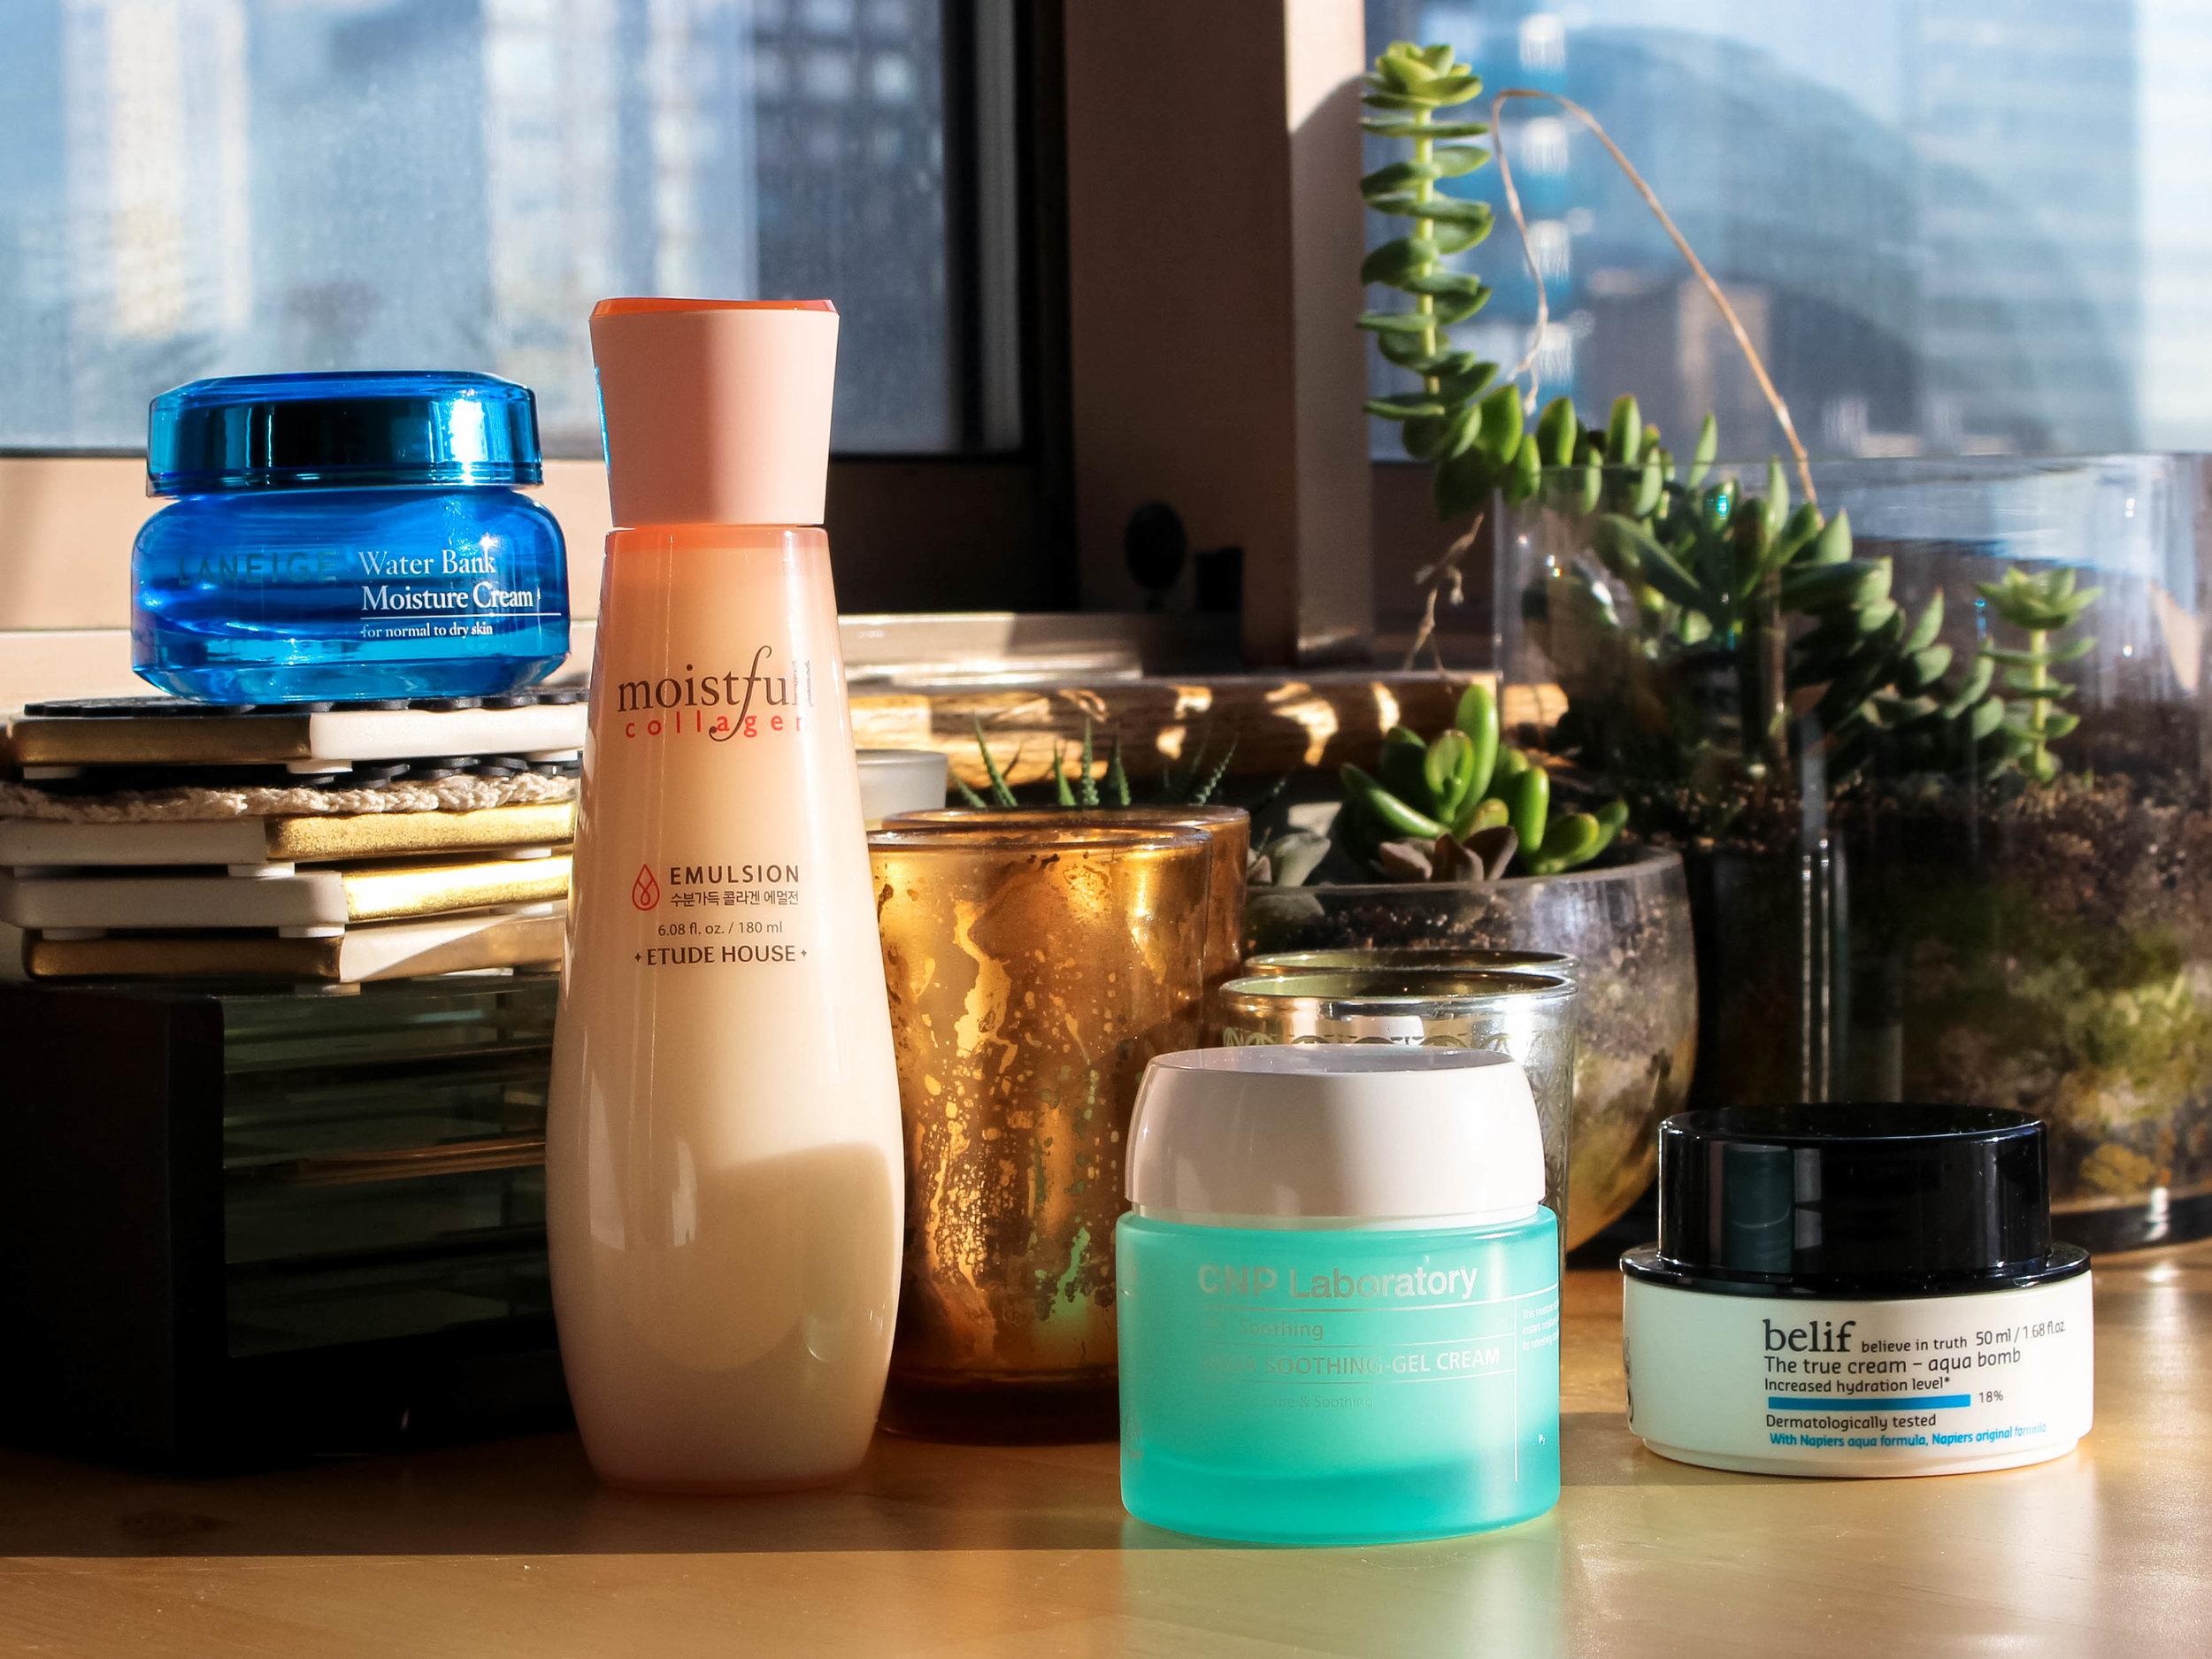 laneige water bank moisture cream  // etude house moistfull collagen emulsion  // cnp laboratory aqua soothing gel cream